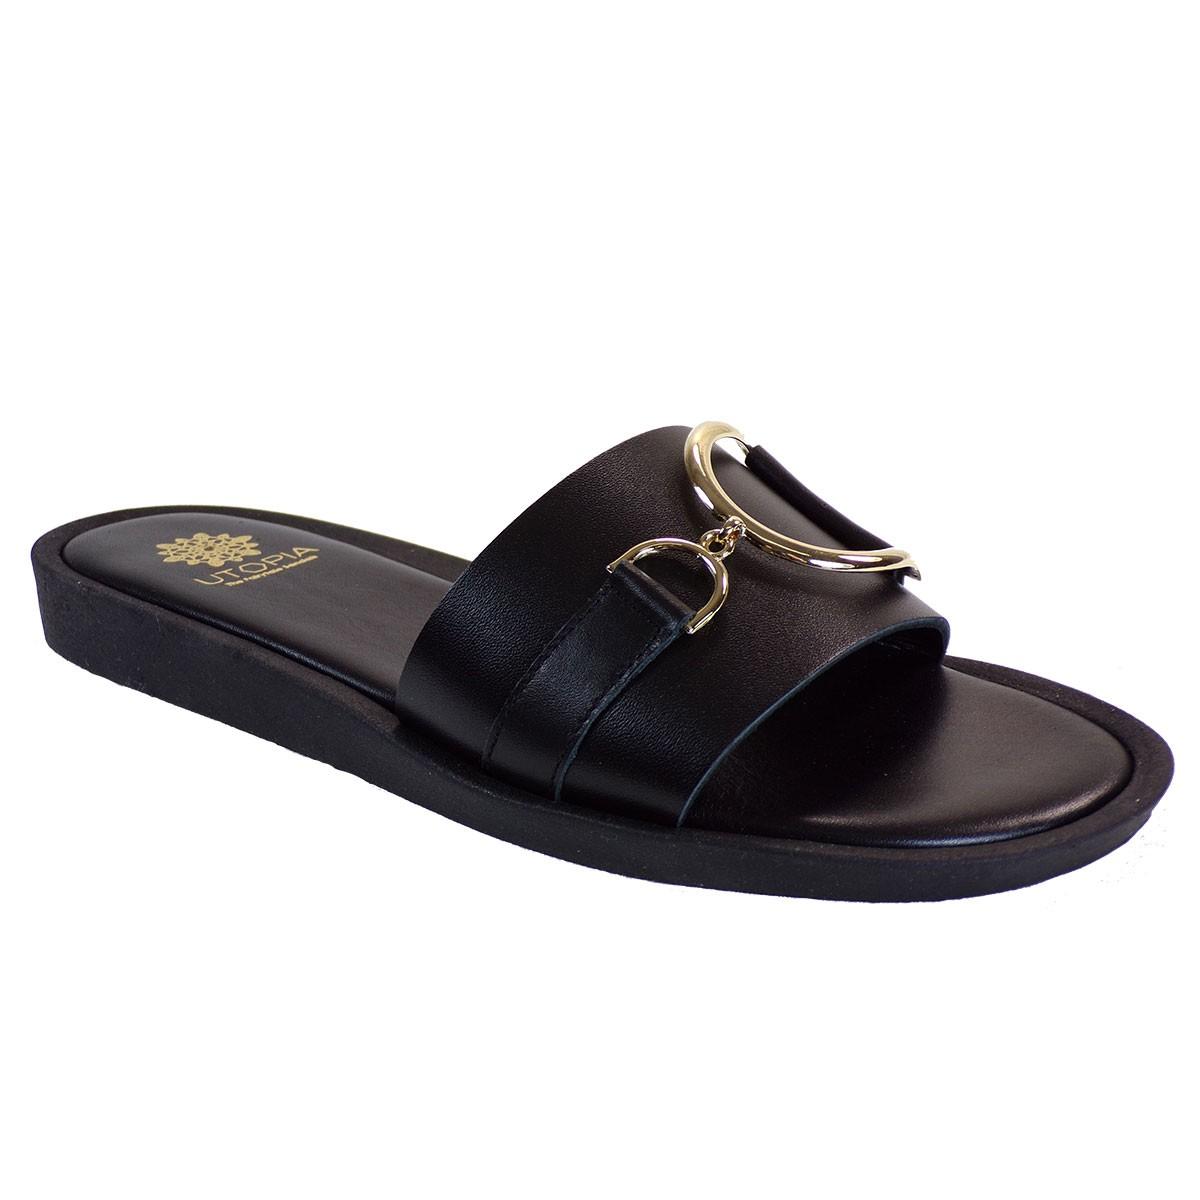 UTOPIA Γυναικεία Παπούτσια Παντόφλες U3-001 Μαύρο Δέρμα